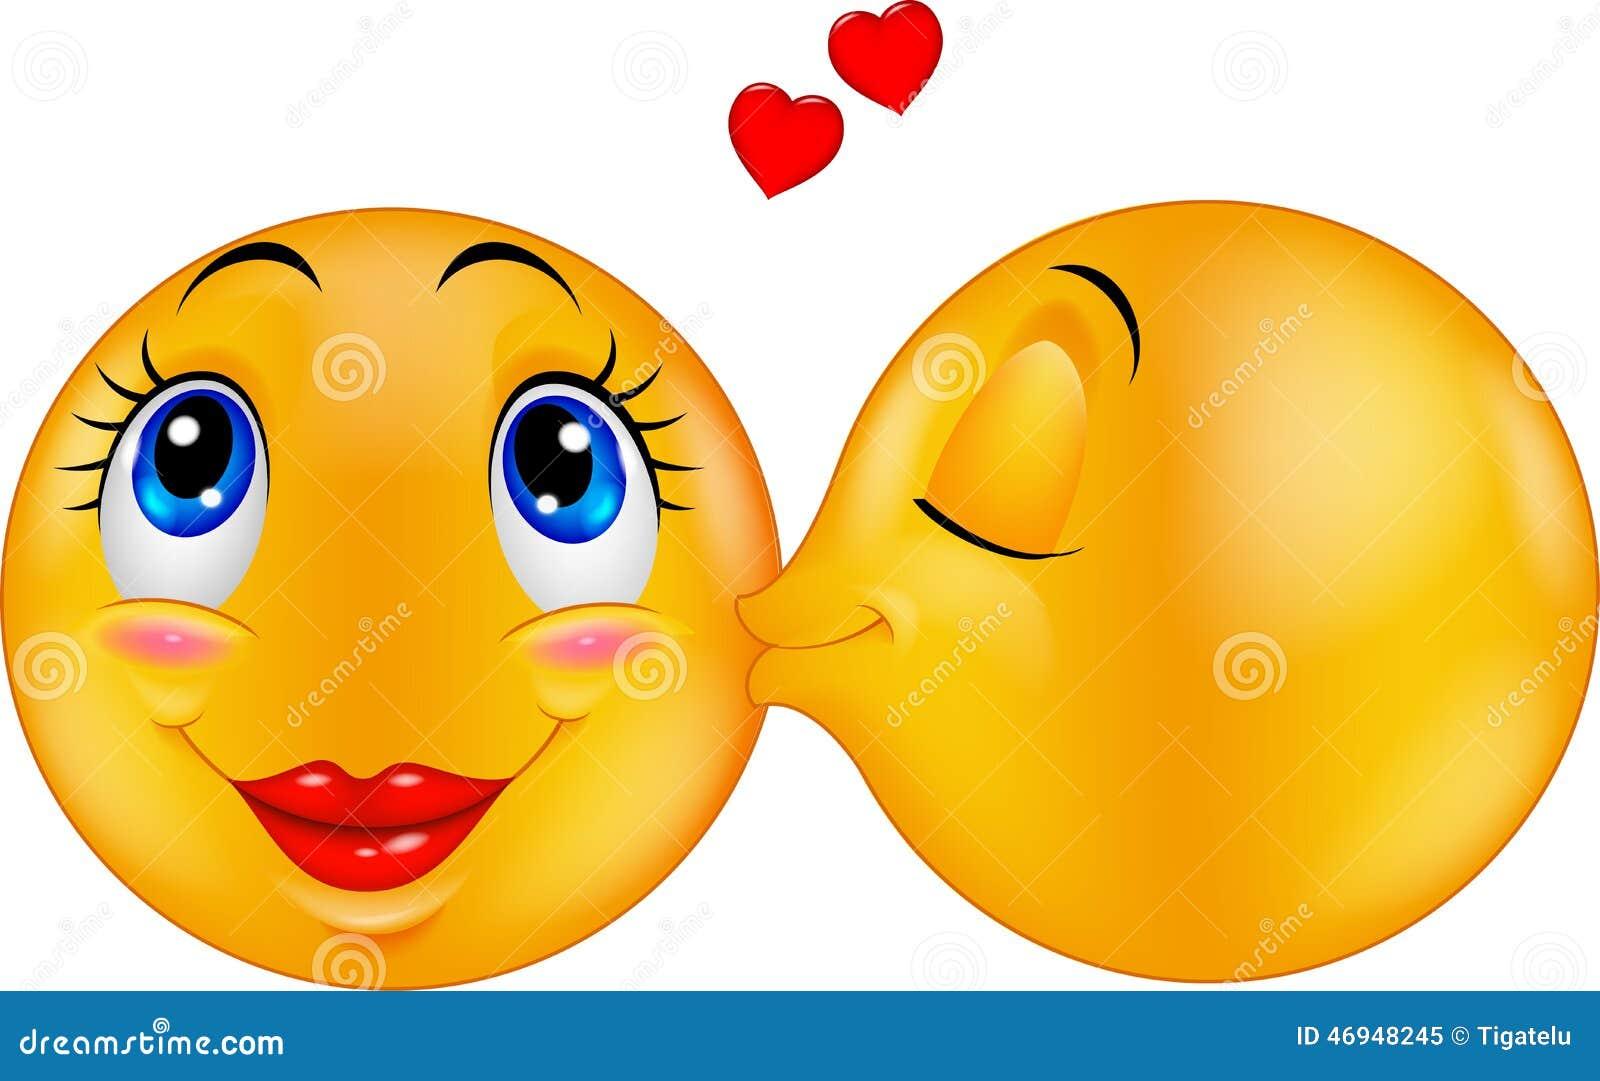 Animated Emoticon Kiss | www.imgkid.com - The Image Kid ...